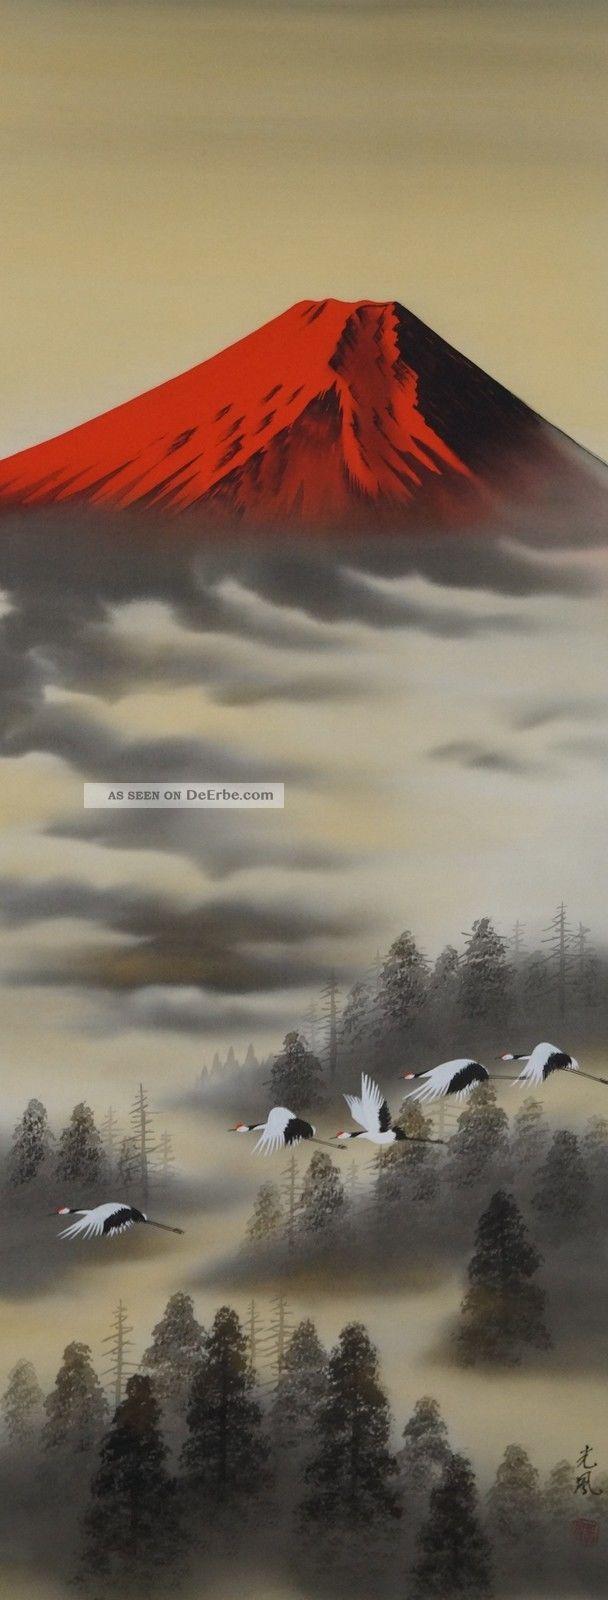 Antikes Japanisches Rollbild Kakejiku Kraniche Und Berg Fuji Japan Scroll 3500 Asiatika: Japan Bild